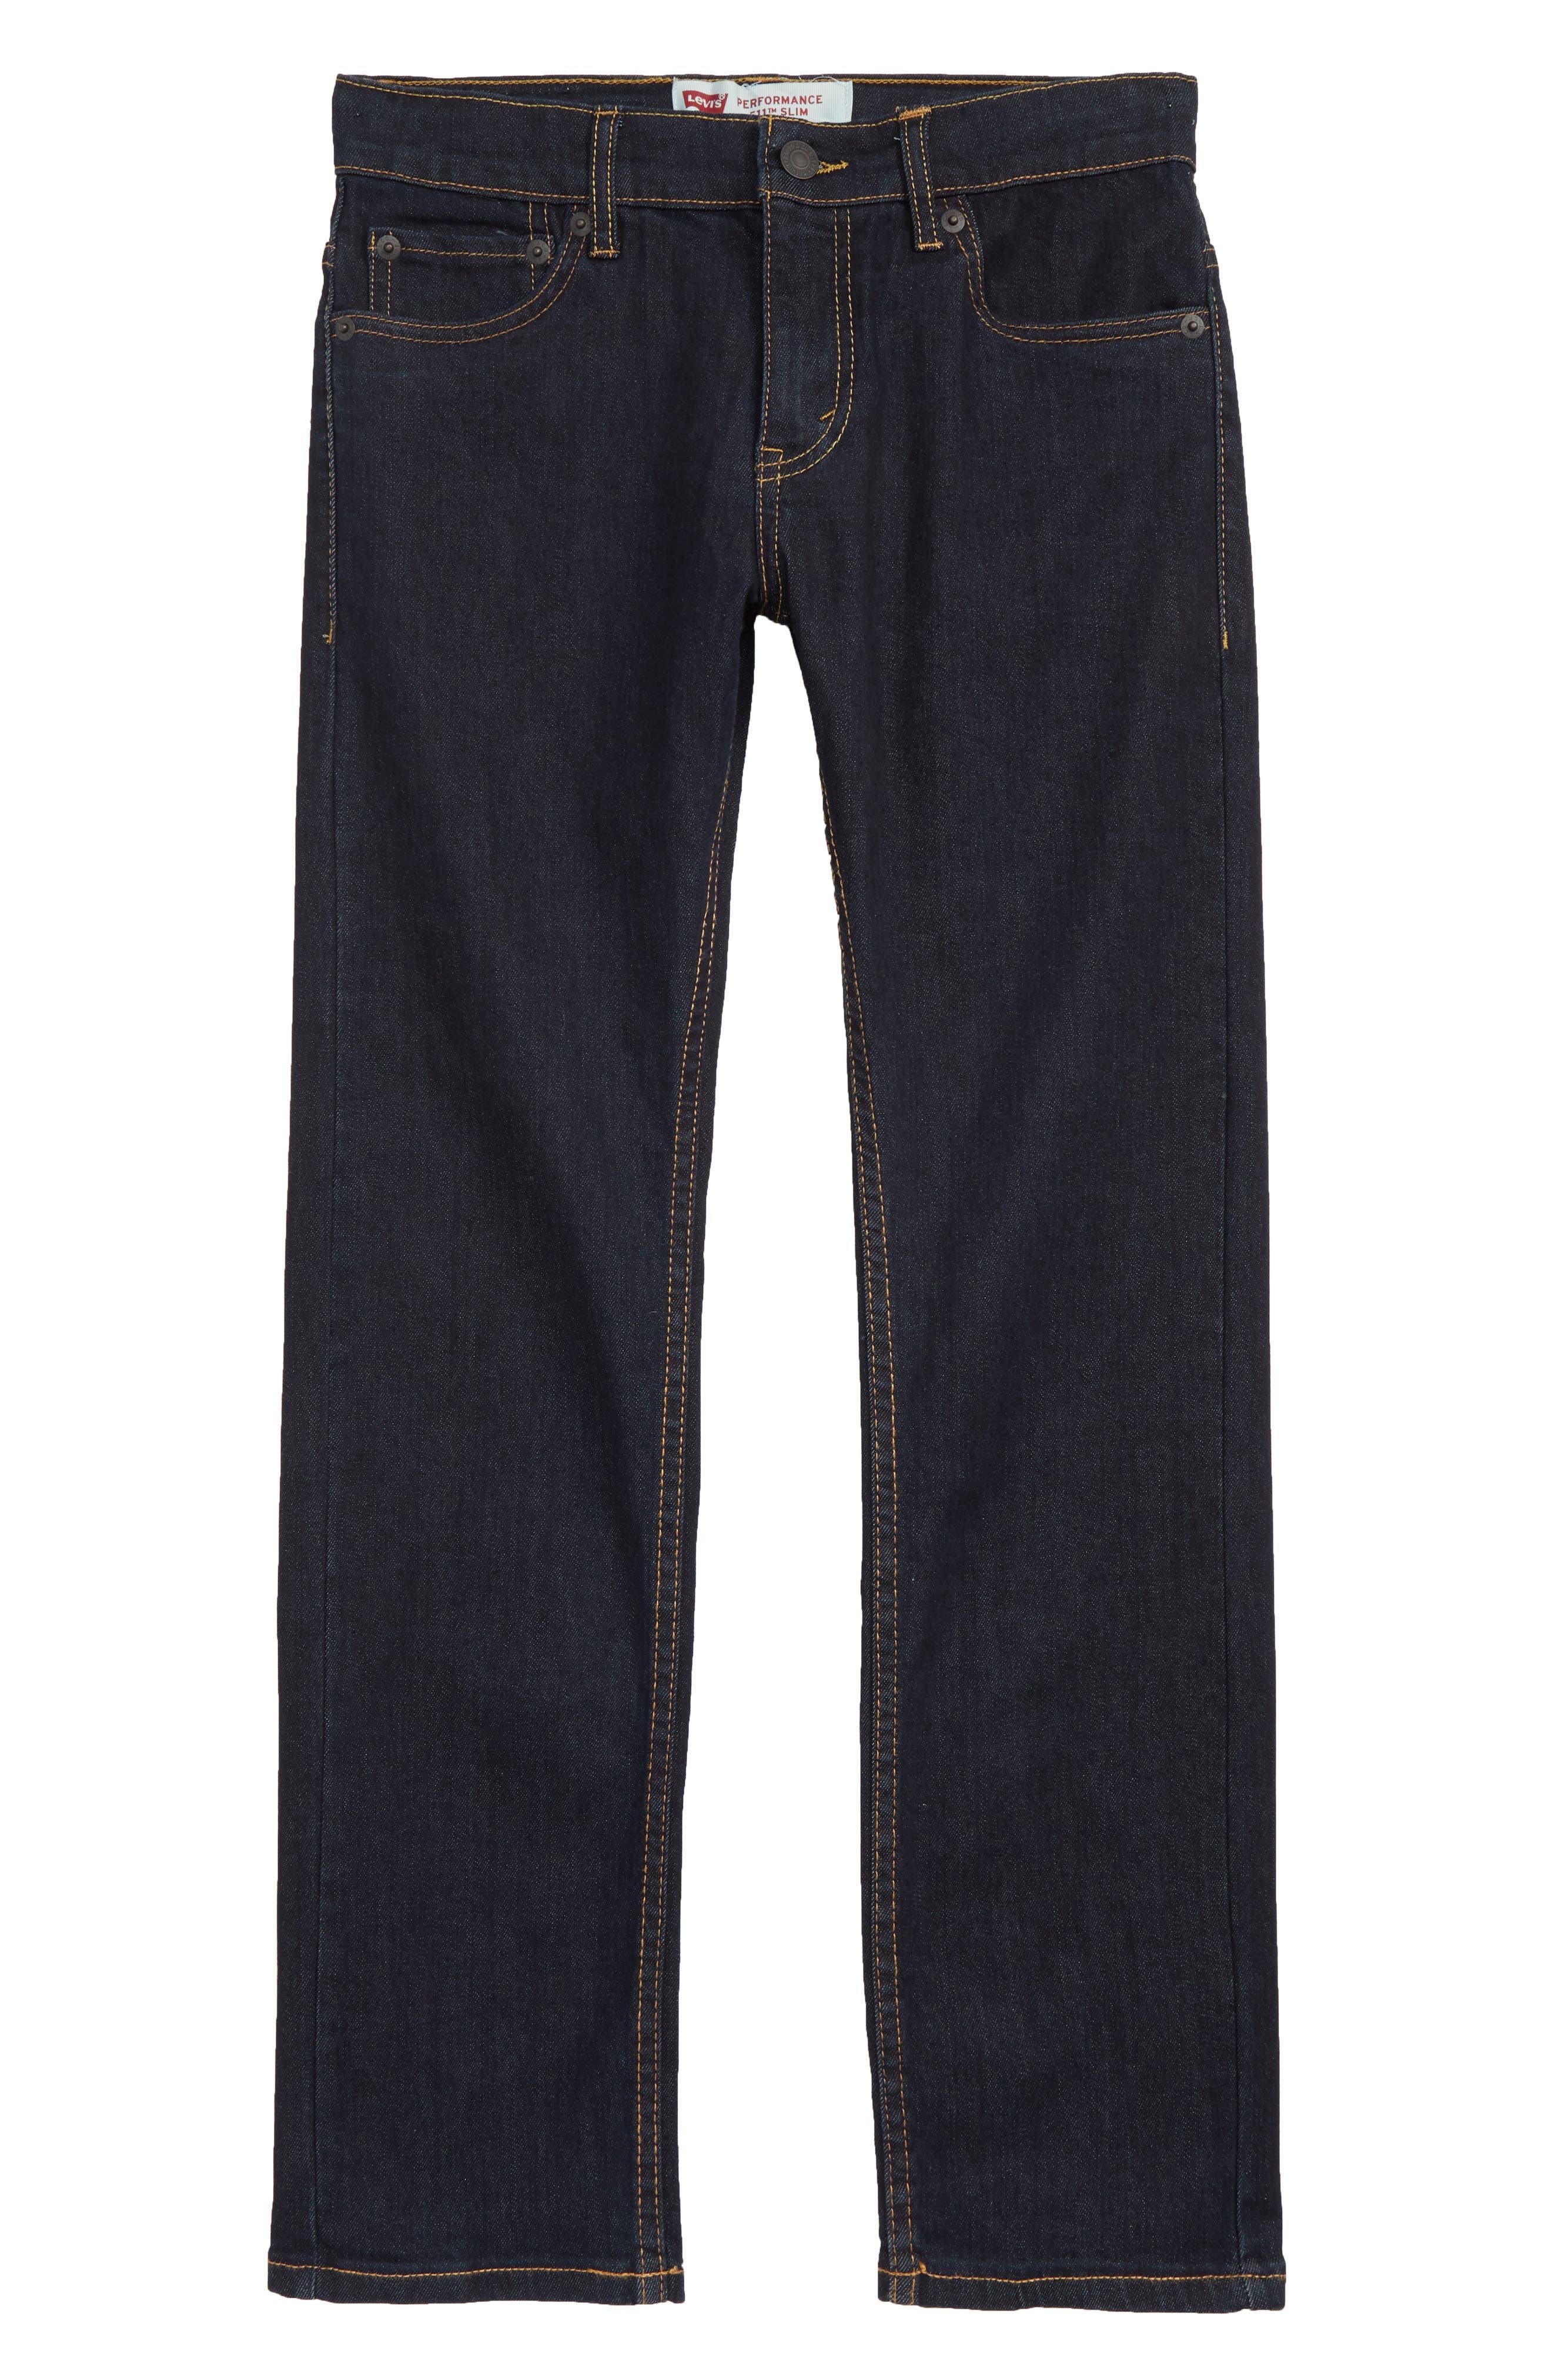 '511<sup>™</sup>' Slim Fit Jeans,                         Main,                         color, ICE CAP